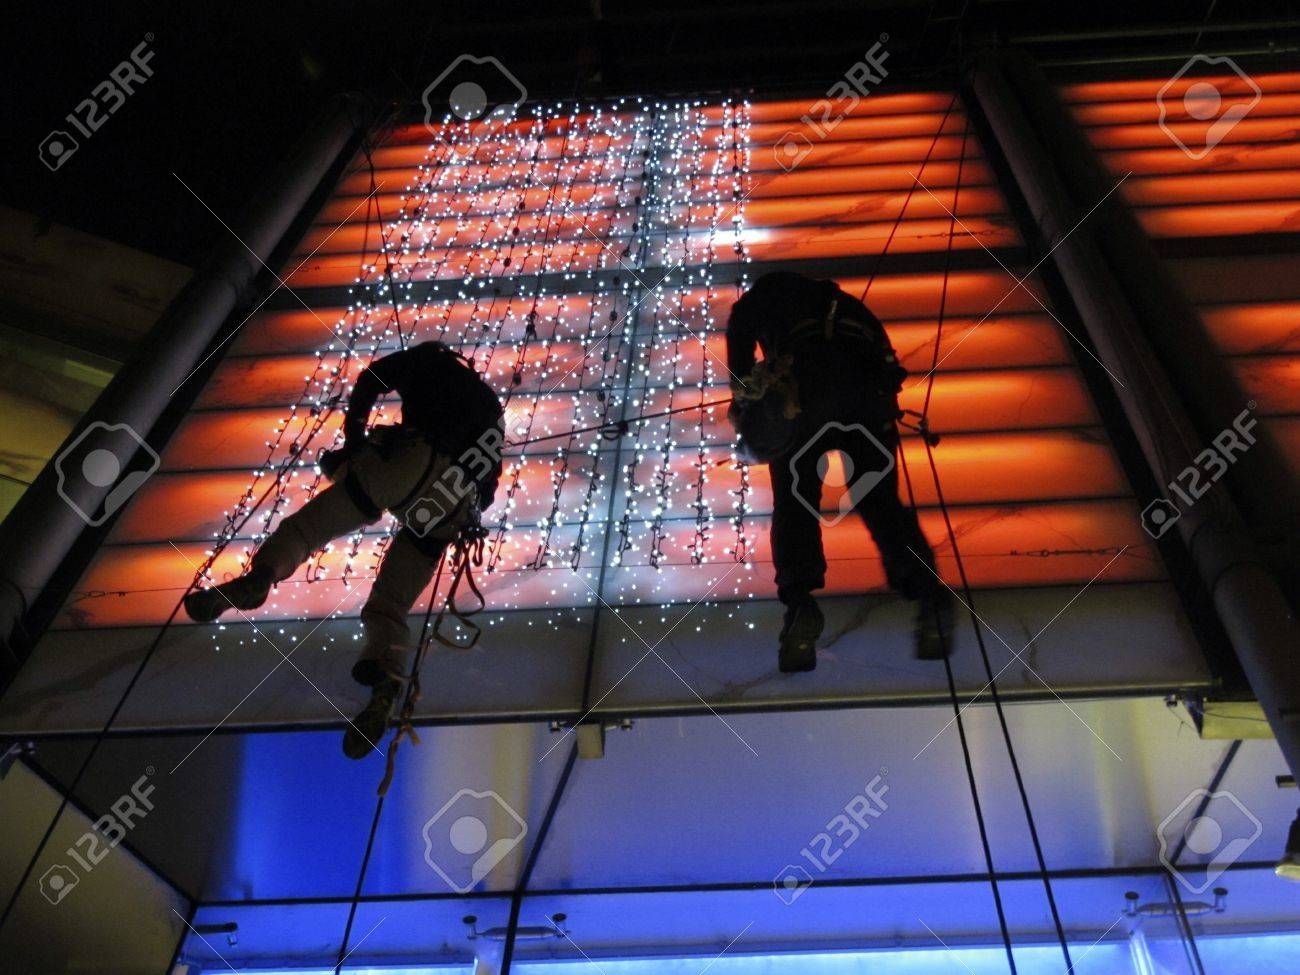 London, Oxford Street, June 2011: Workmen working overhead fixing lights at night. Stock Photo - 9890497